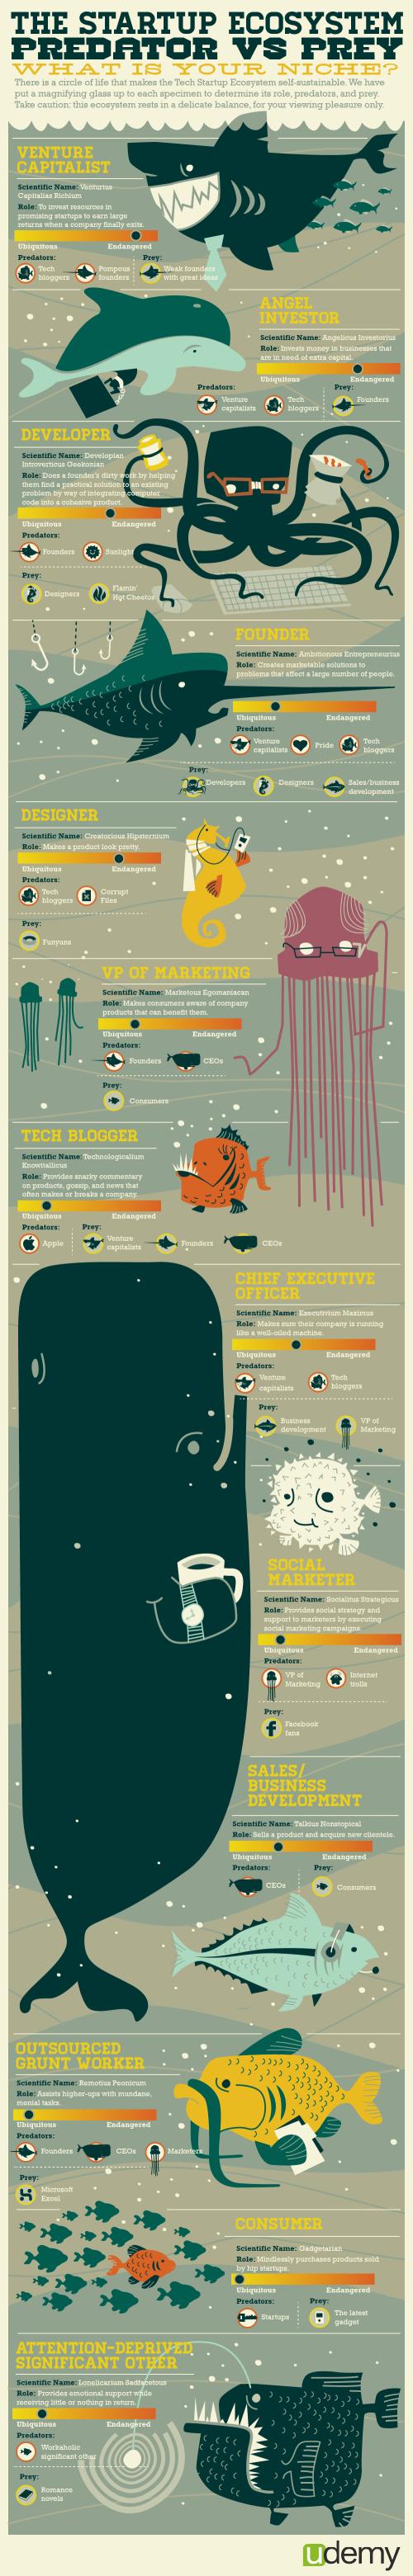 The Startup Ecosystem: Predator vs. Prey infographic